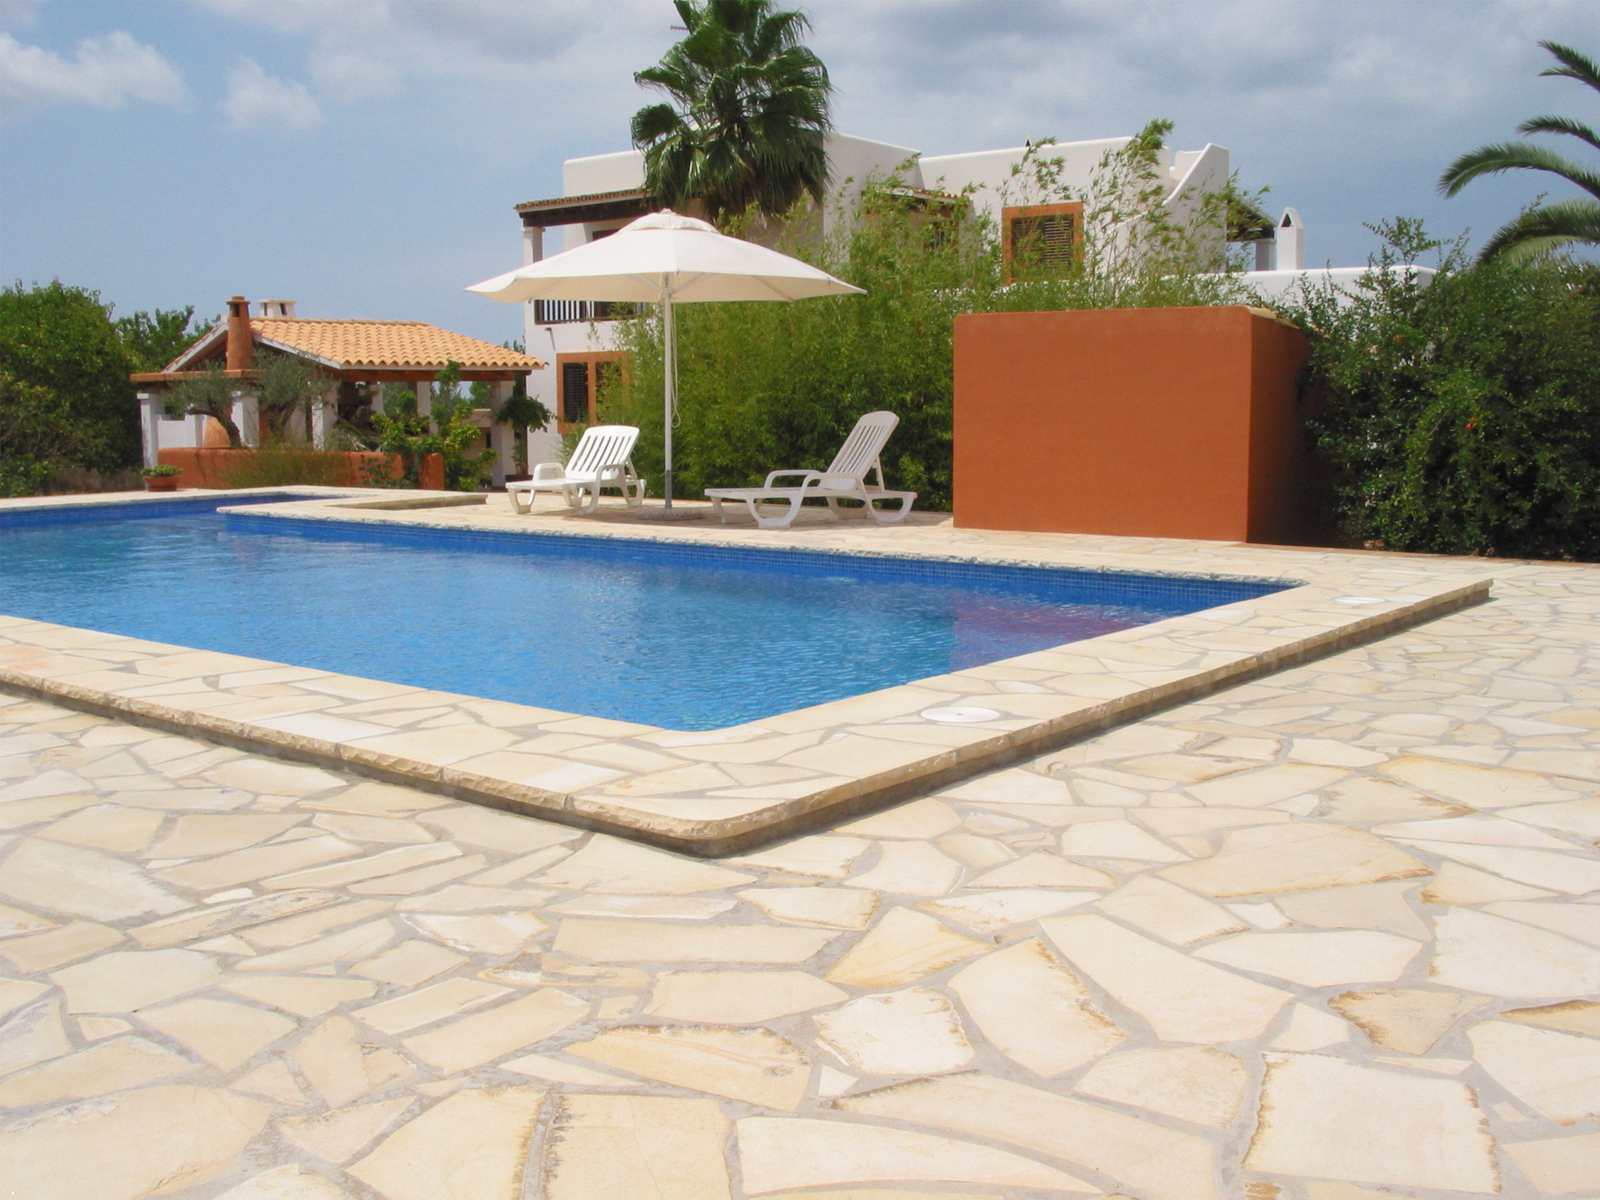 Solnhofen f sil laja irregular - Piedra natural para piscinas ...